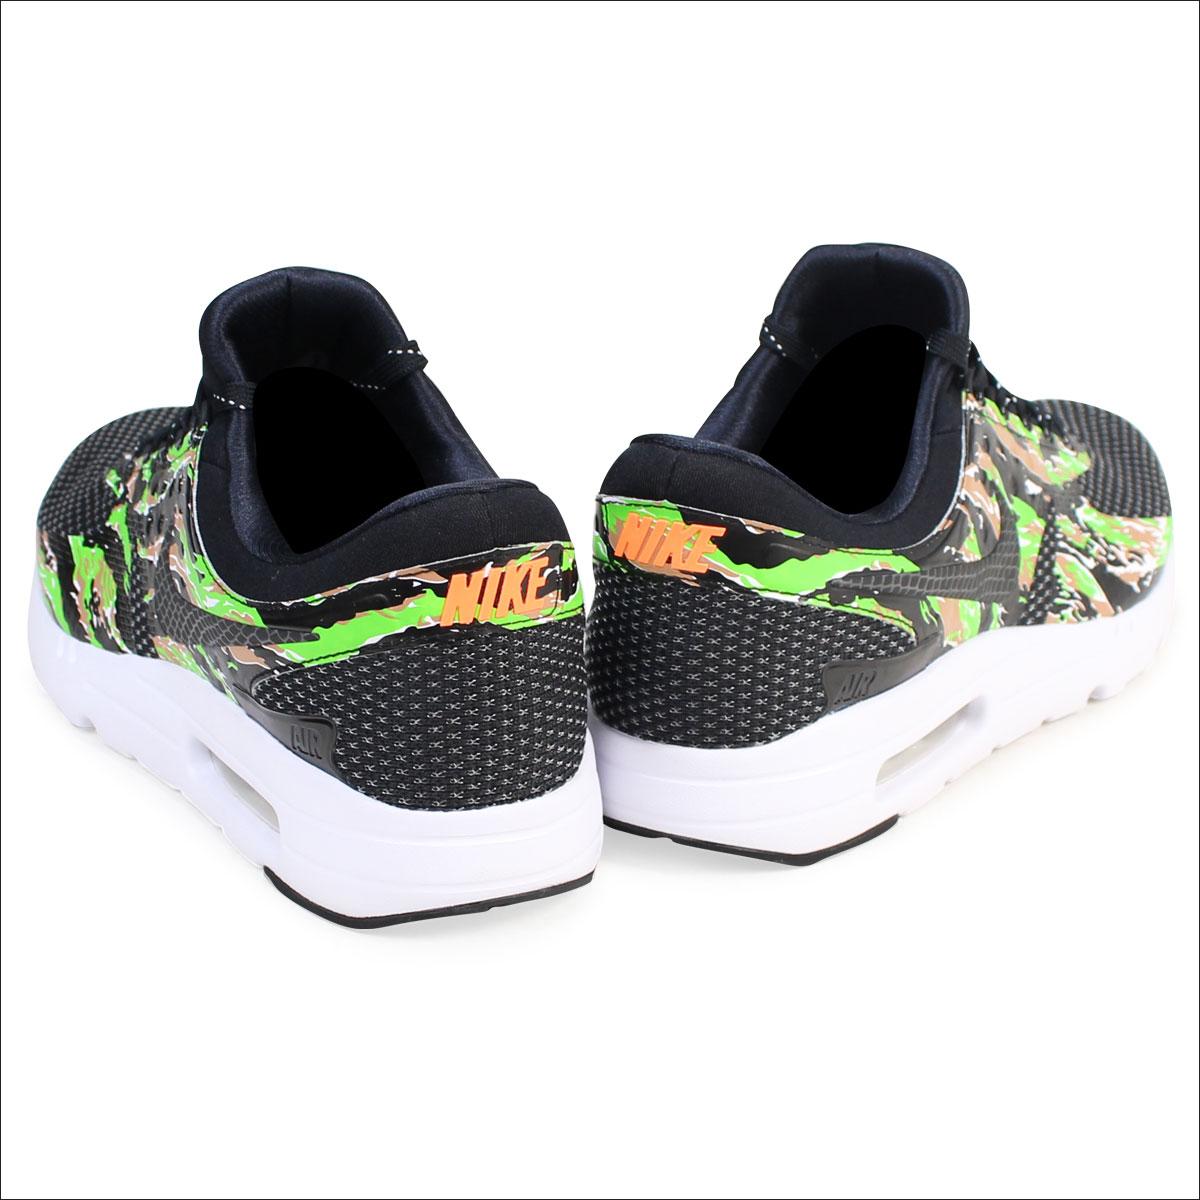 best service 84195 9cc13 ... Nike NIKE Air Max sneakers AIR MAX ZERO ID ATMOS TIGER CAMO AA4630-993  men